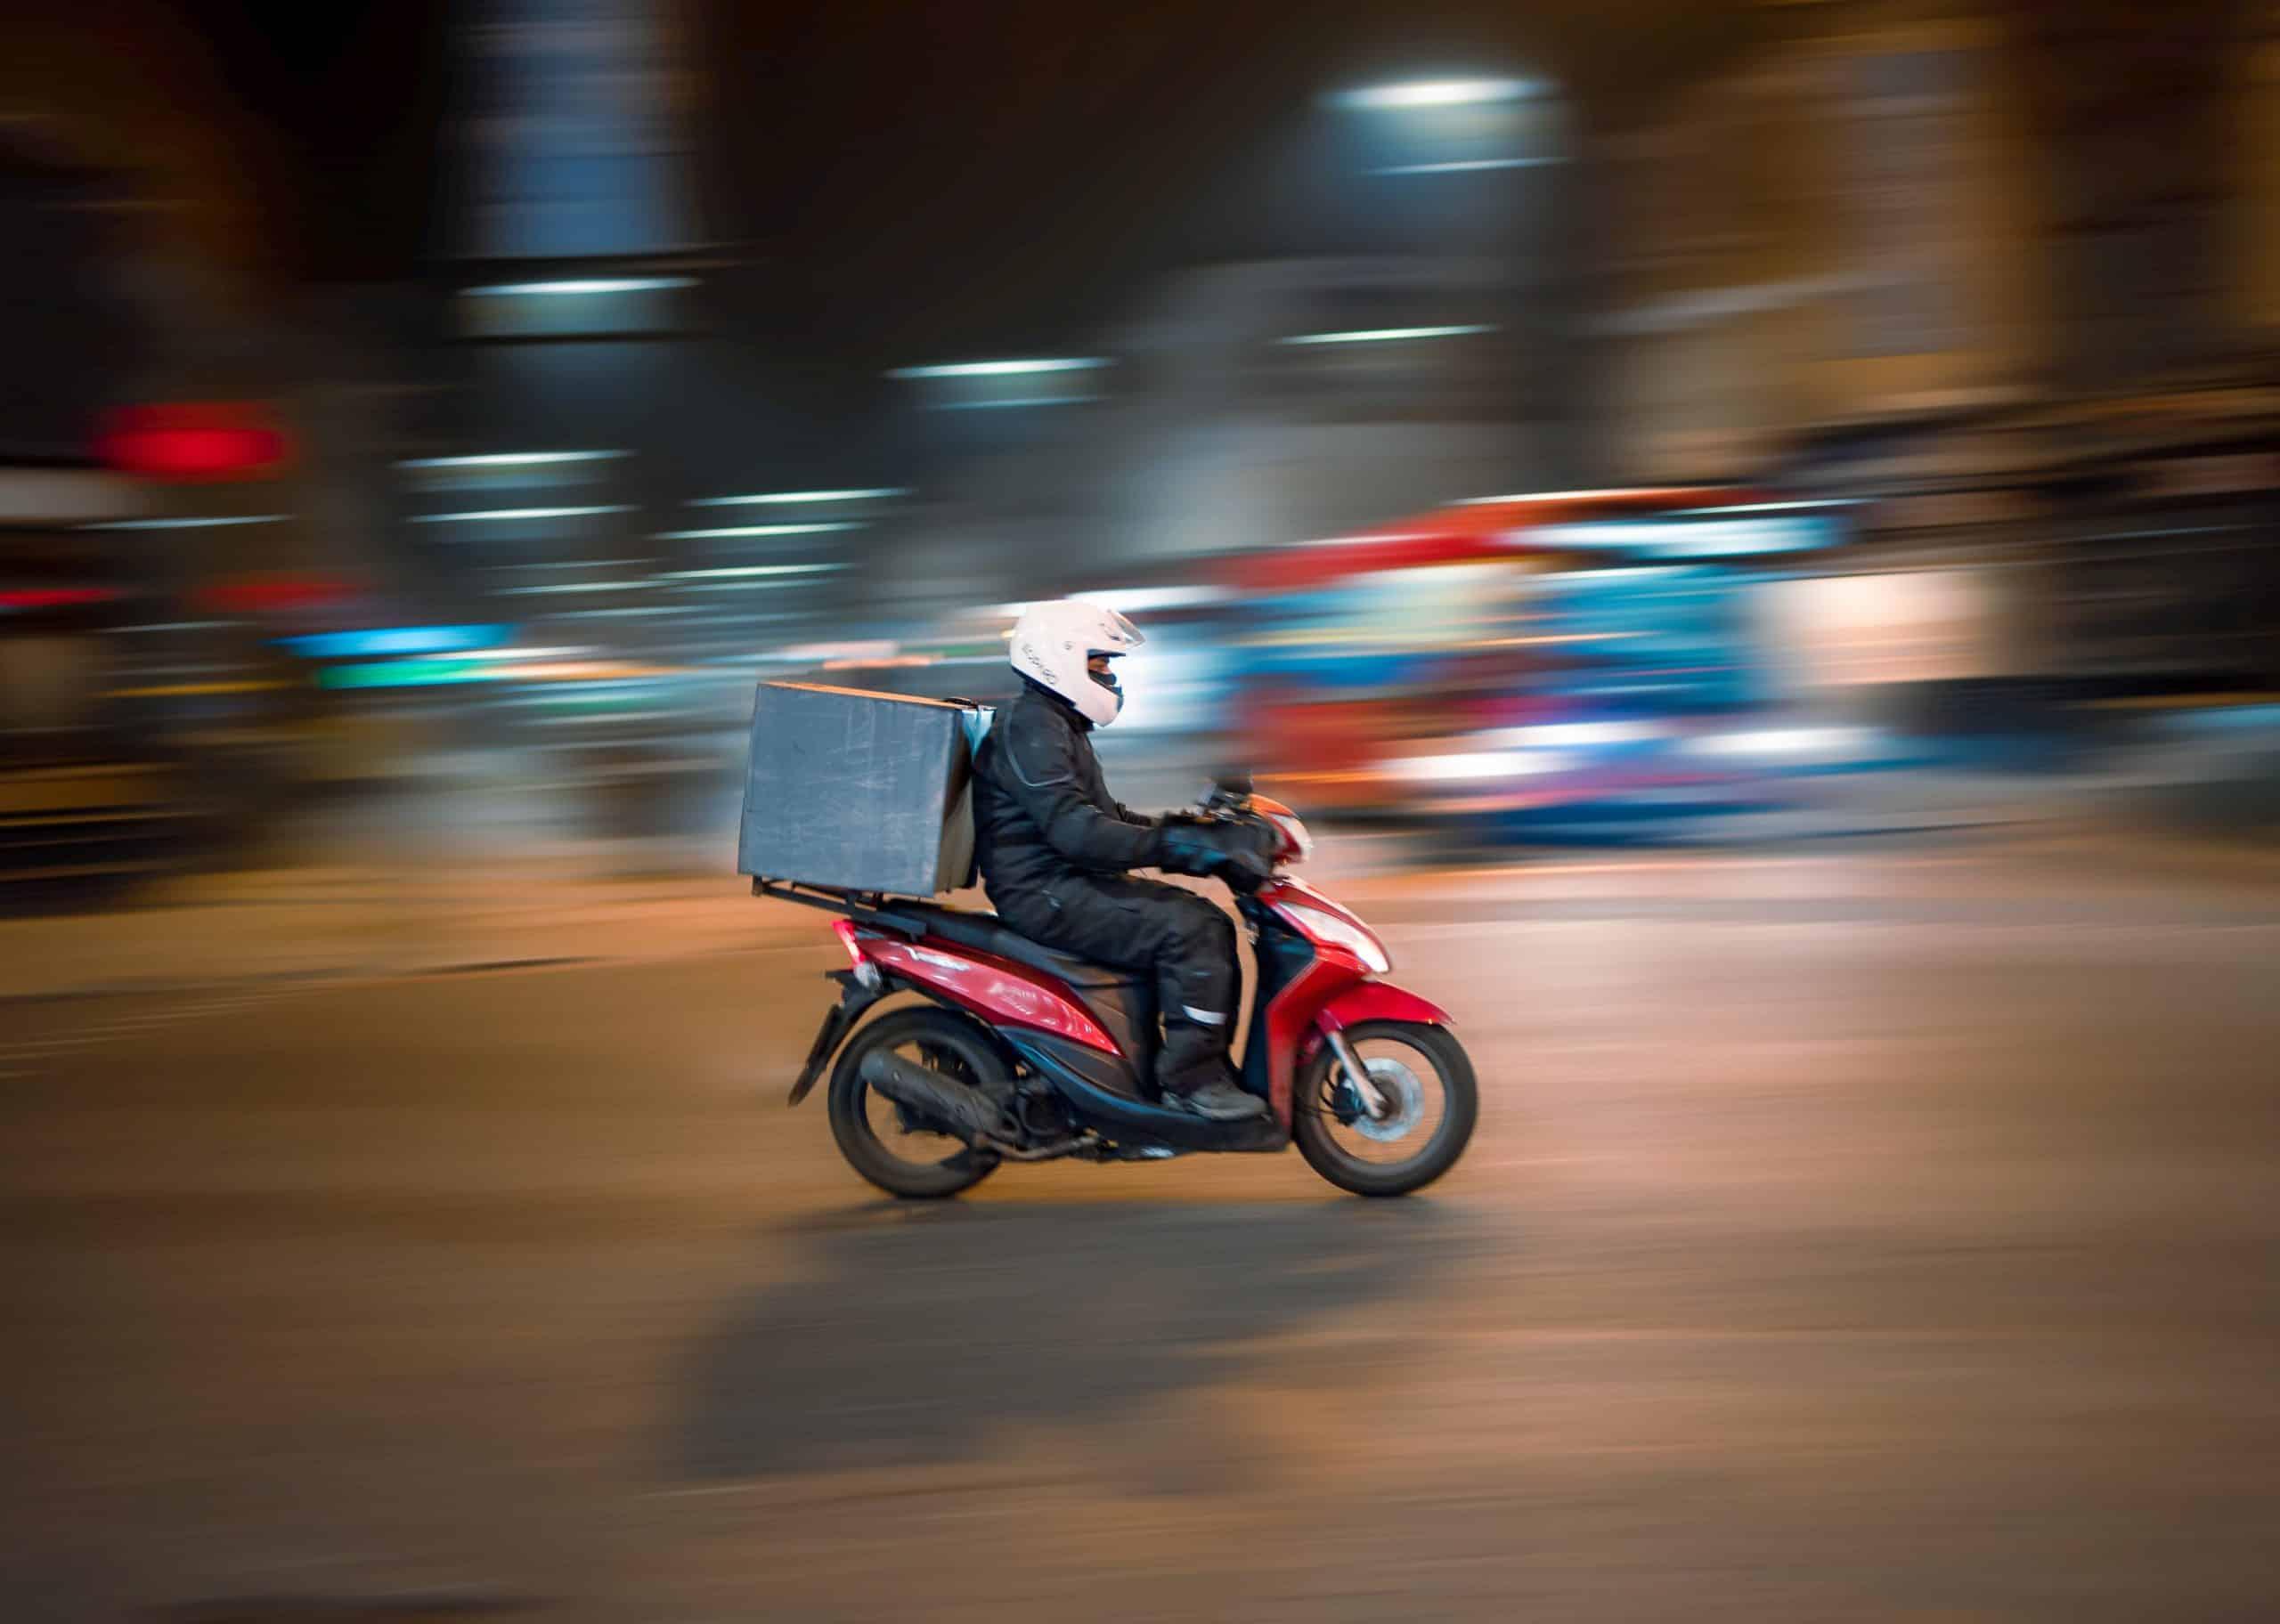 Read more about the article 雜貨店老板 成功申請摩托車貸款20萬|機車貸款成功案例